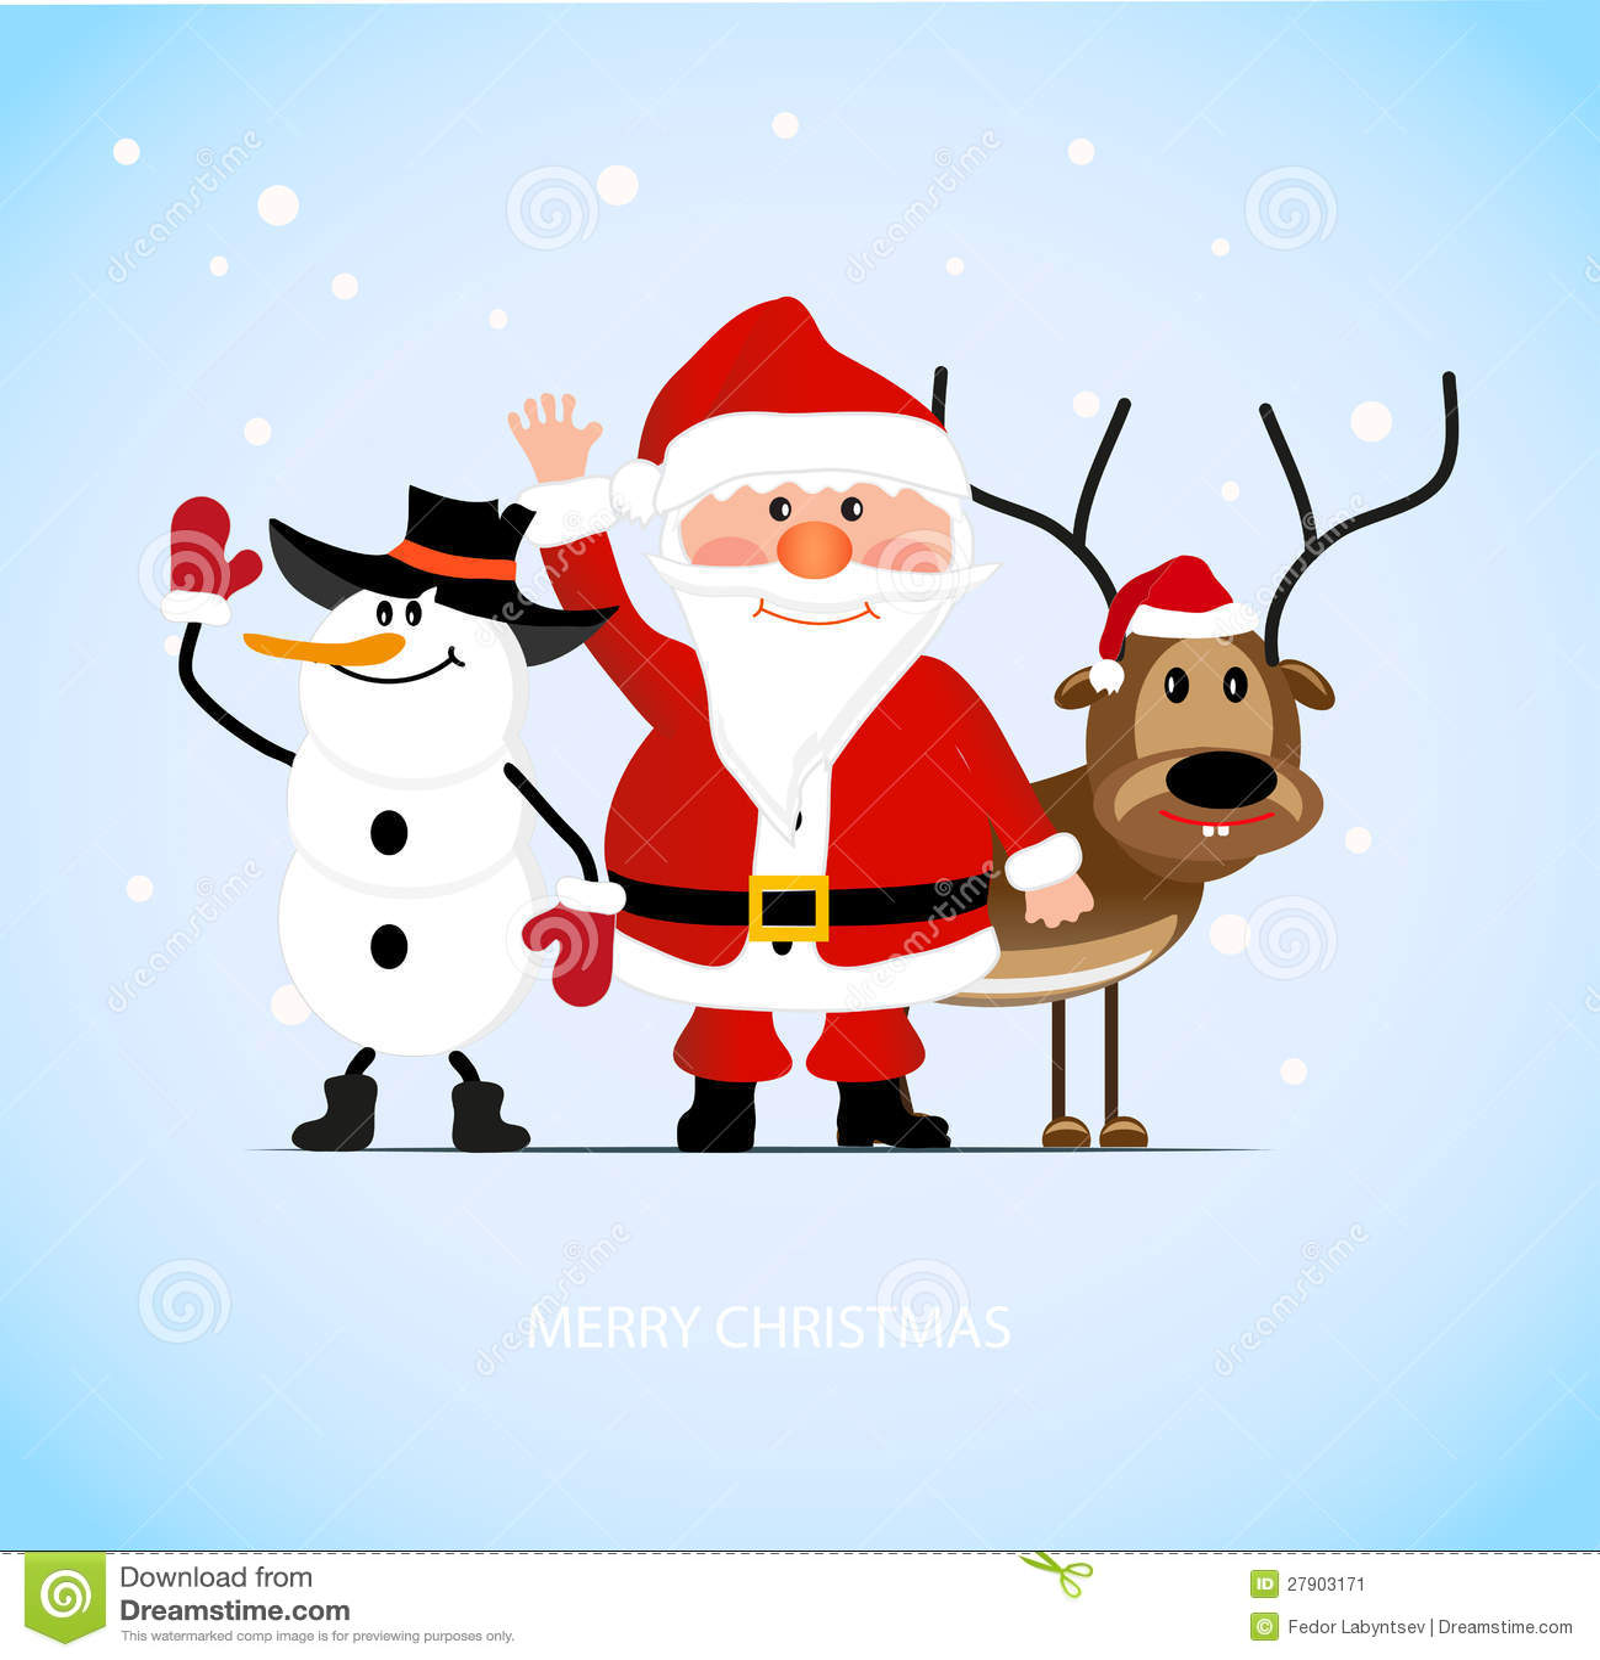 santa claus with a cheerful deer and a snowman - Santa And Snowman